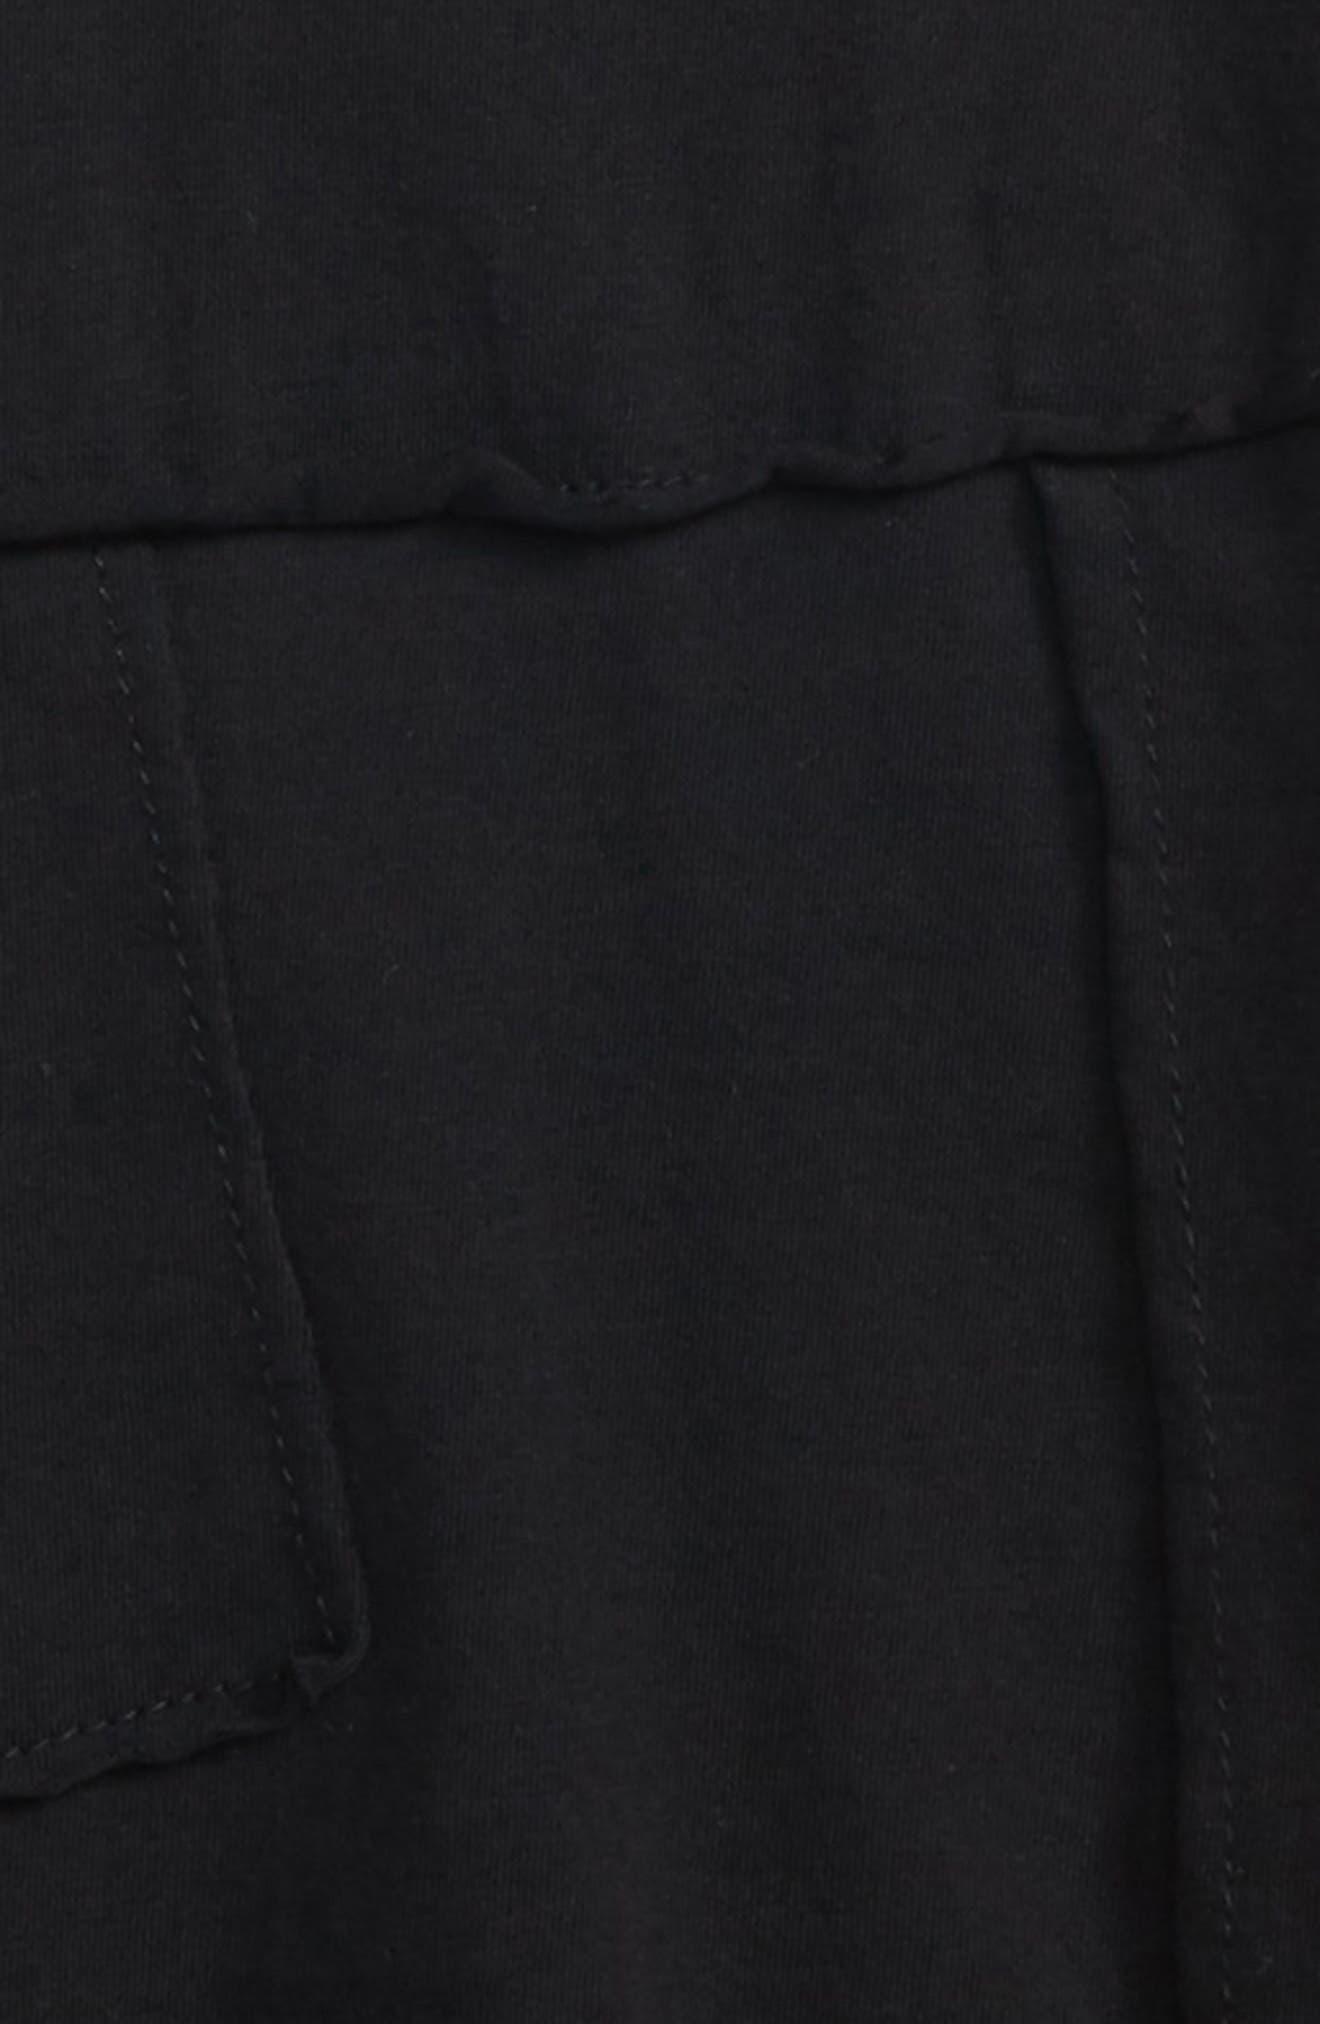 Patchwork Shirt,                             Alternate thumbnail 2, color,                             Black